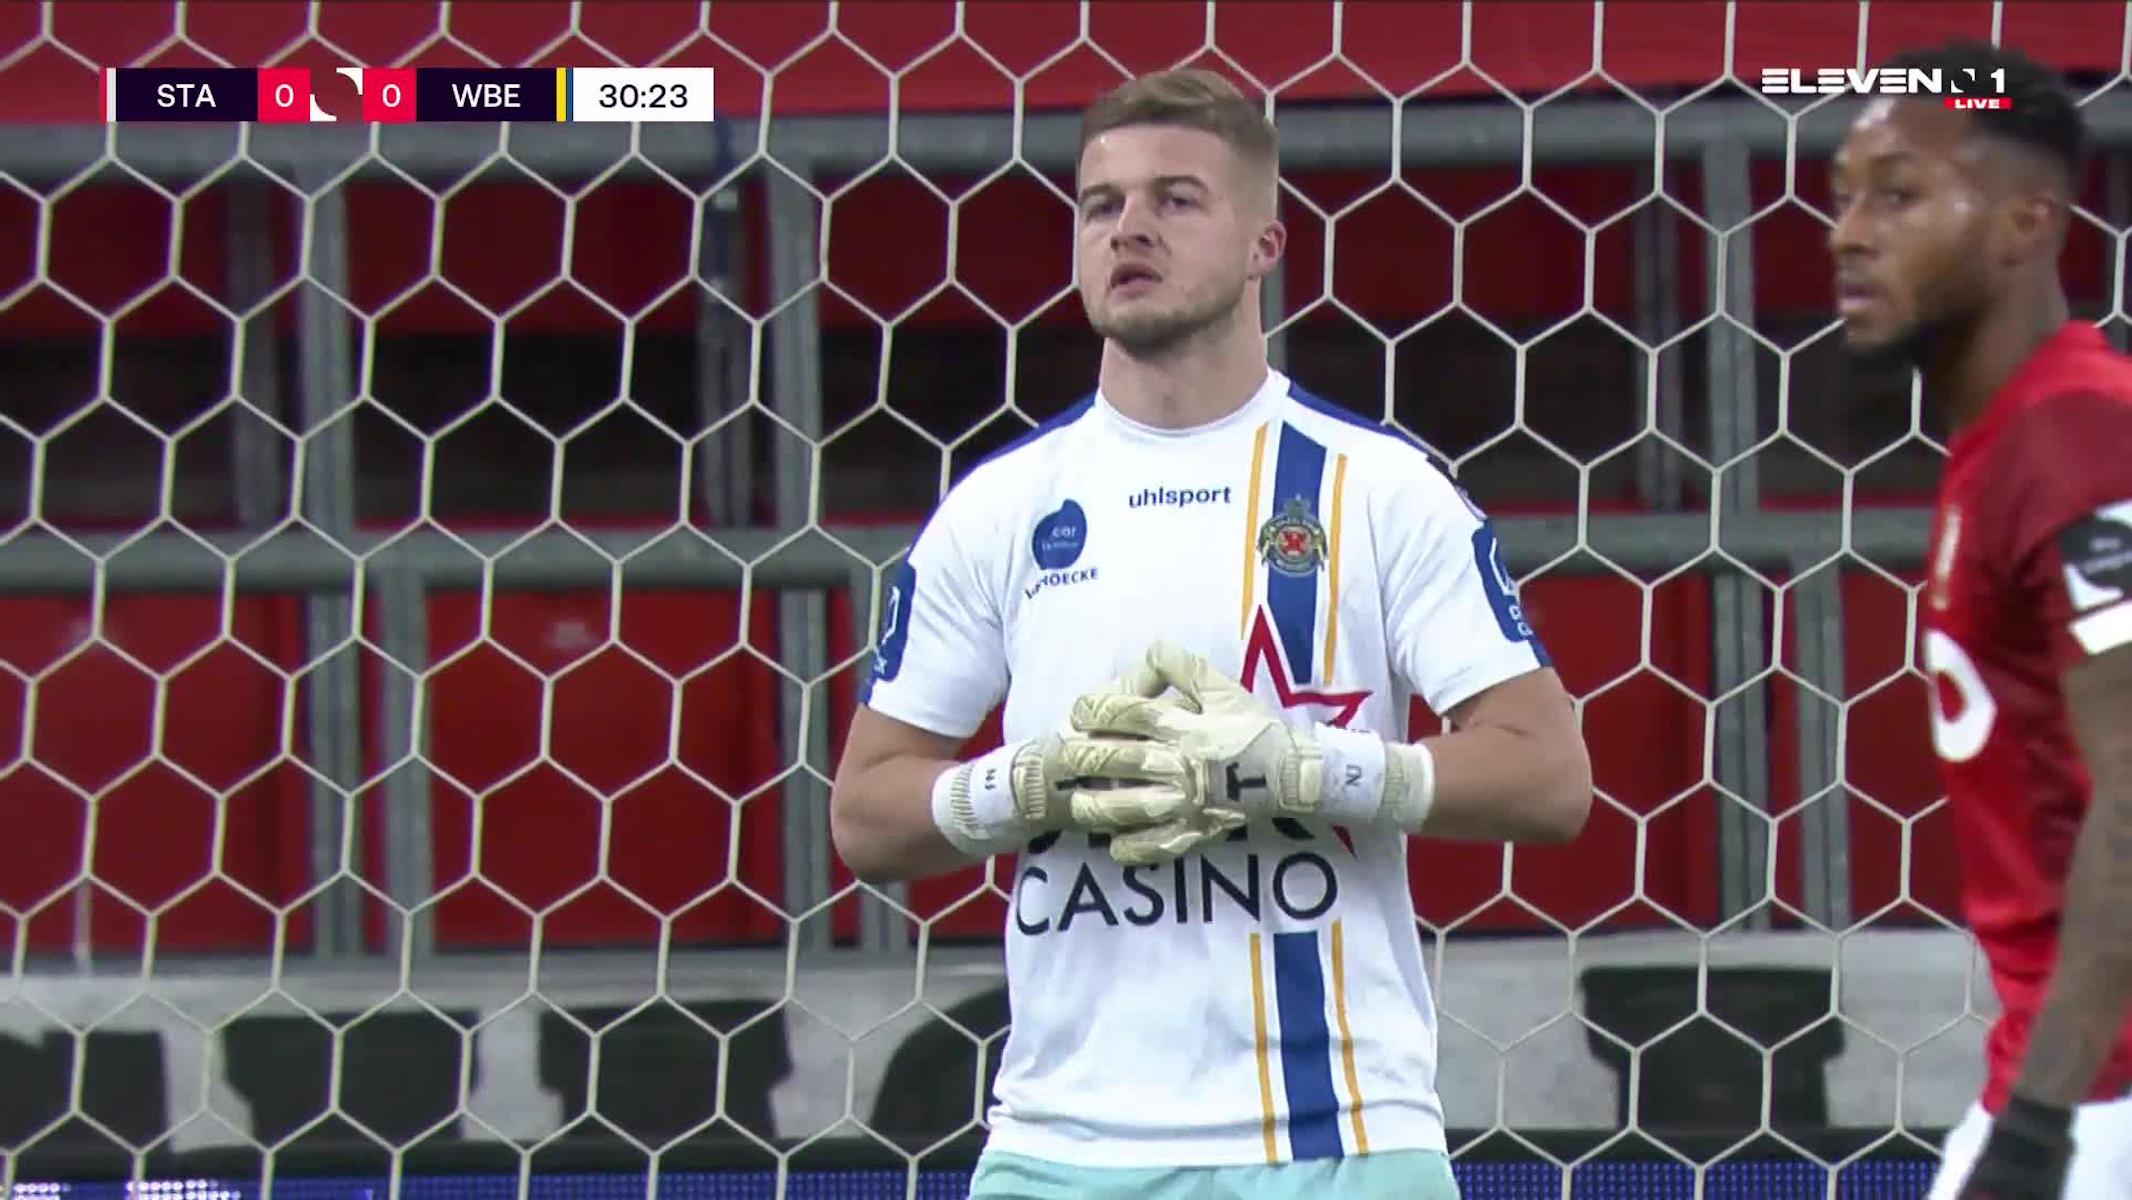 Doelpunt Selim Amallah (Standard de Liège vs. Waasland-Beveren)